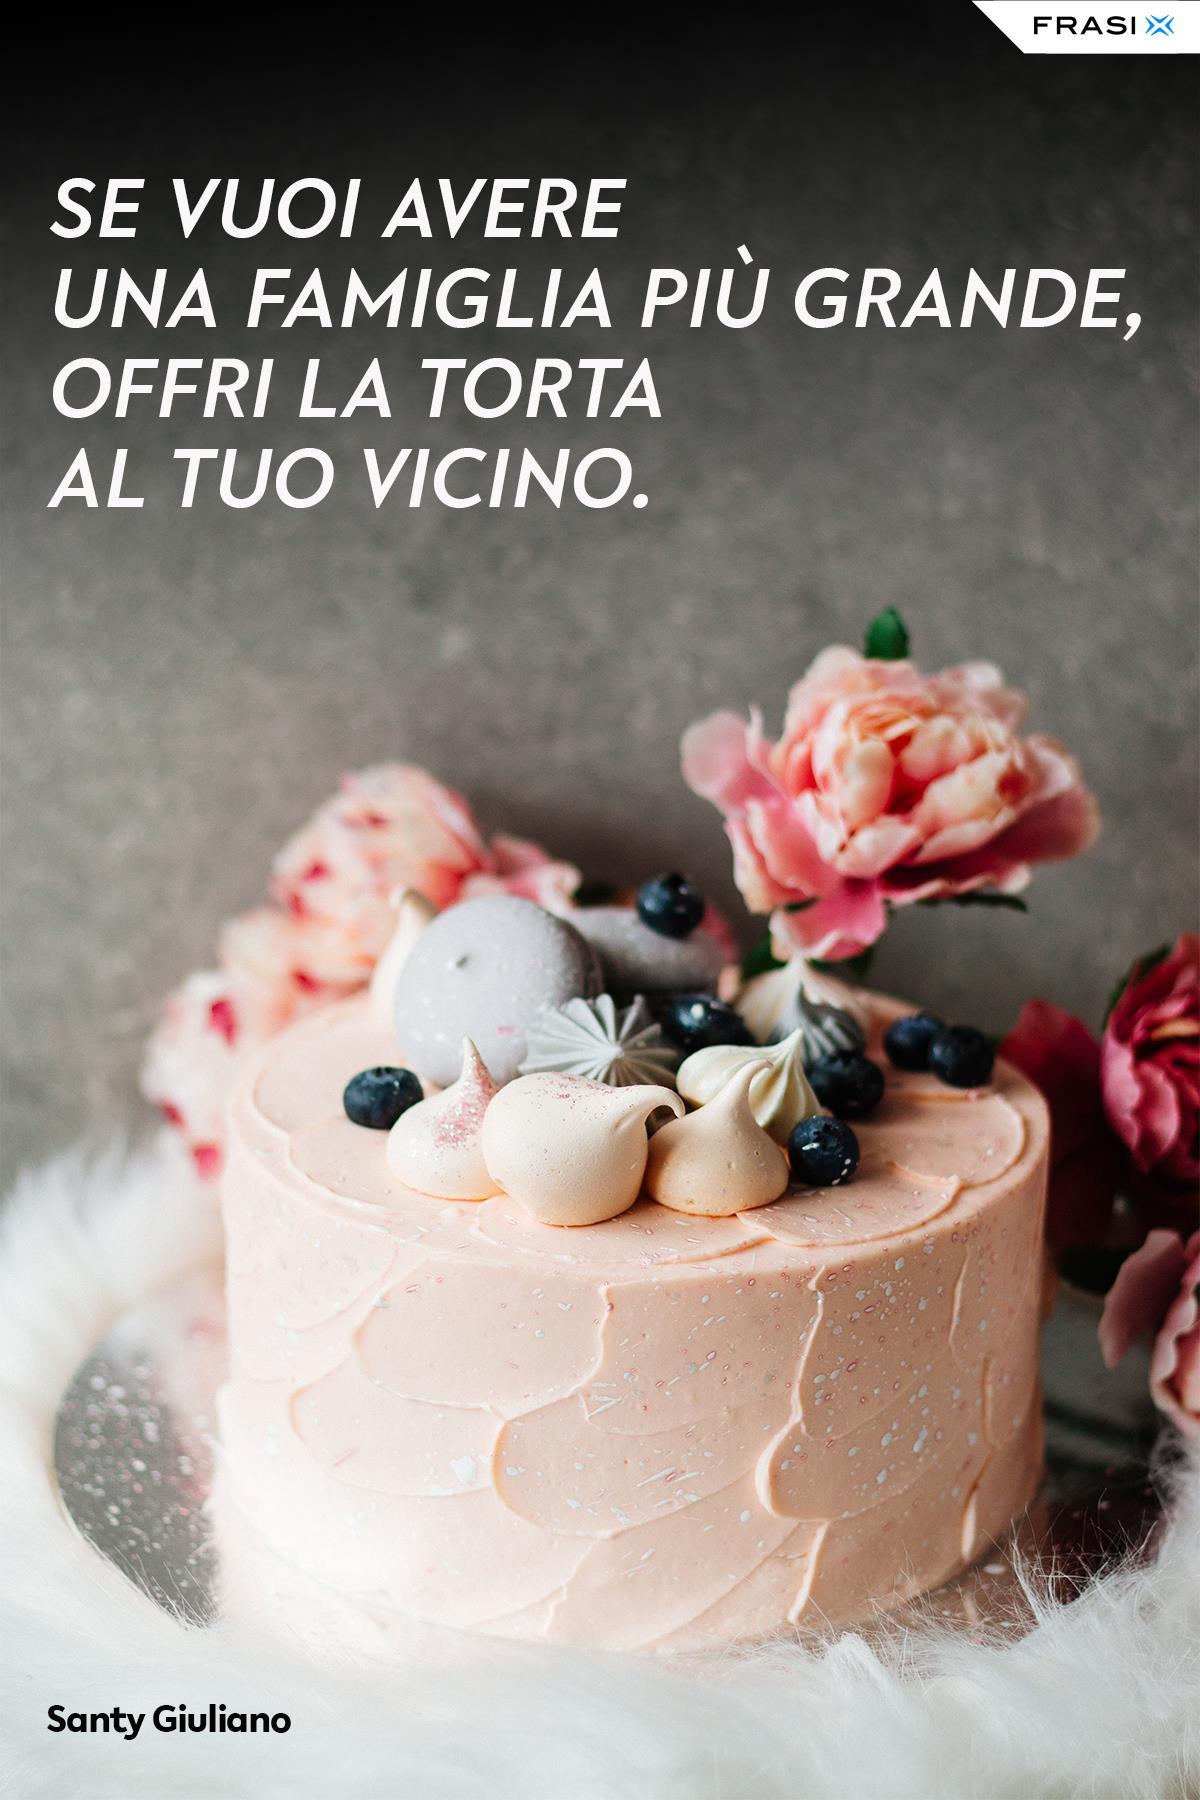 Frasi su torte vicino Santy Giuliano